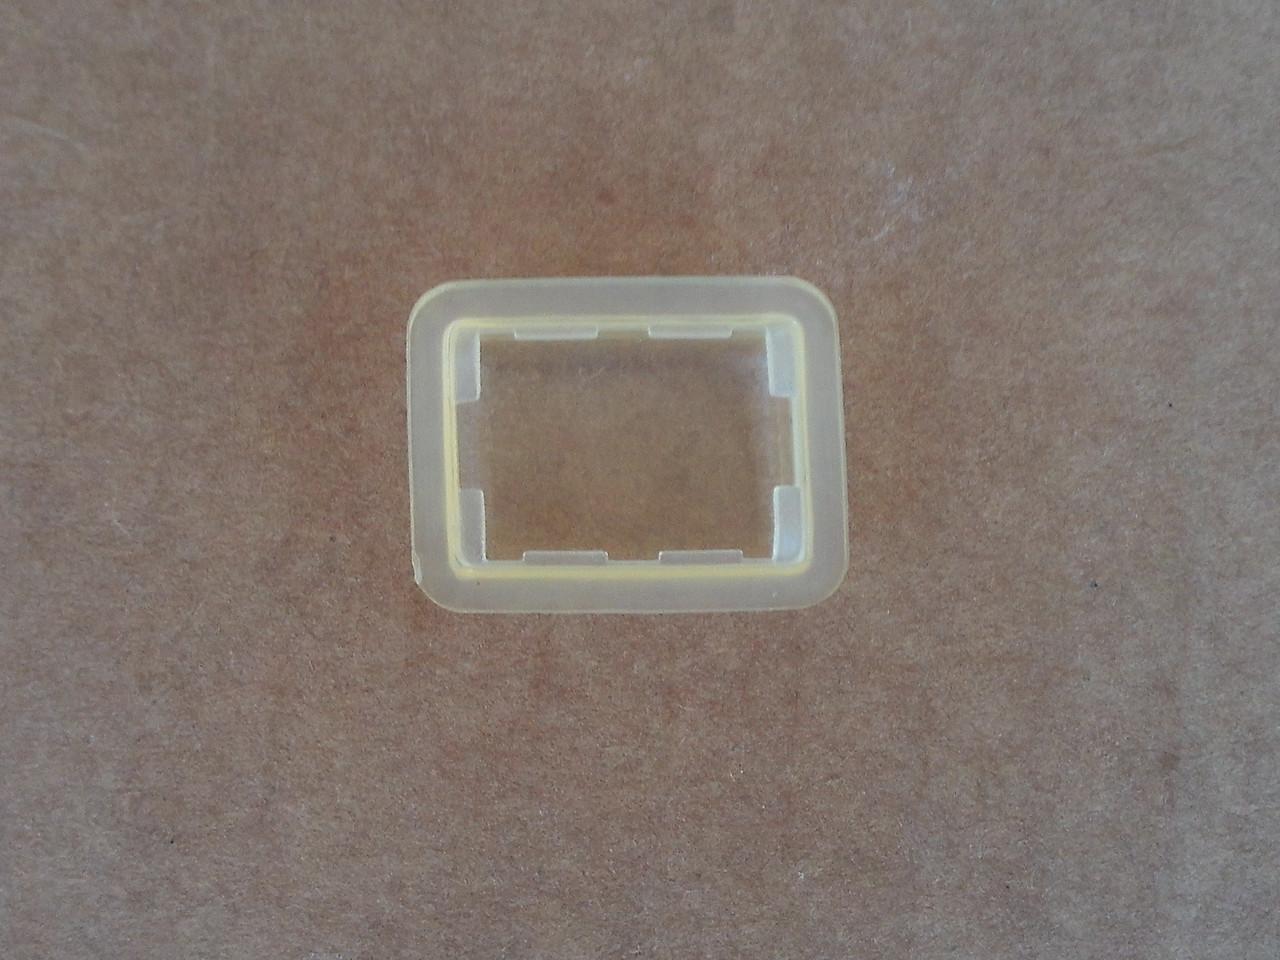 Stop Switch Cover for Stihl BG45, BG46, BG55, BG65, BG85, SH55, SH85, 42294351700, 4229 435 1700